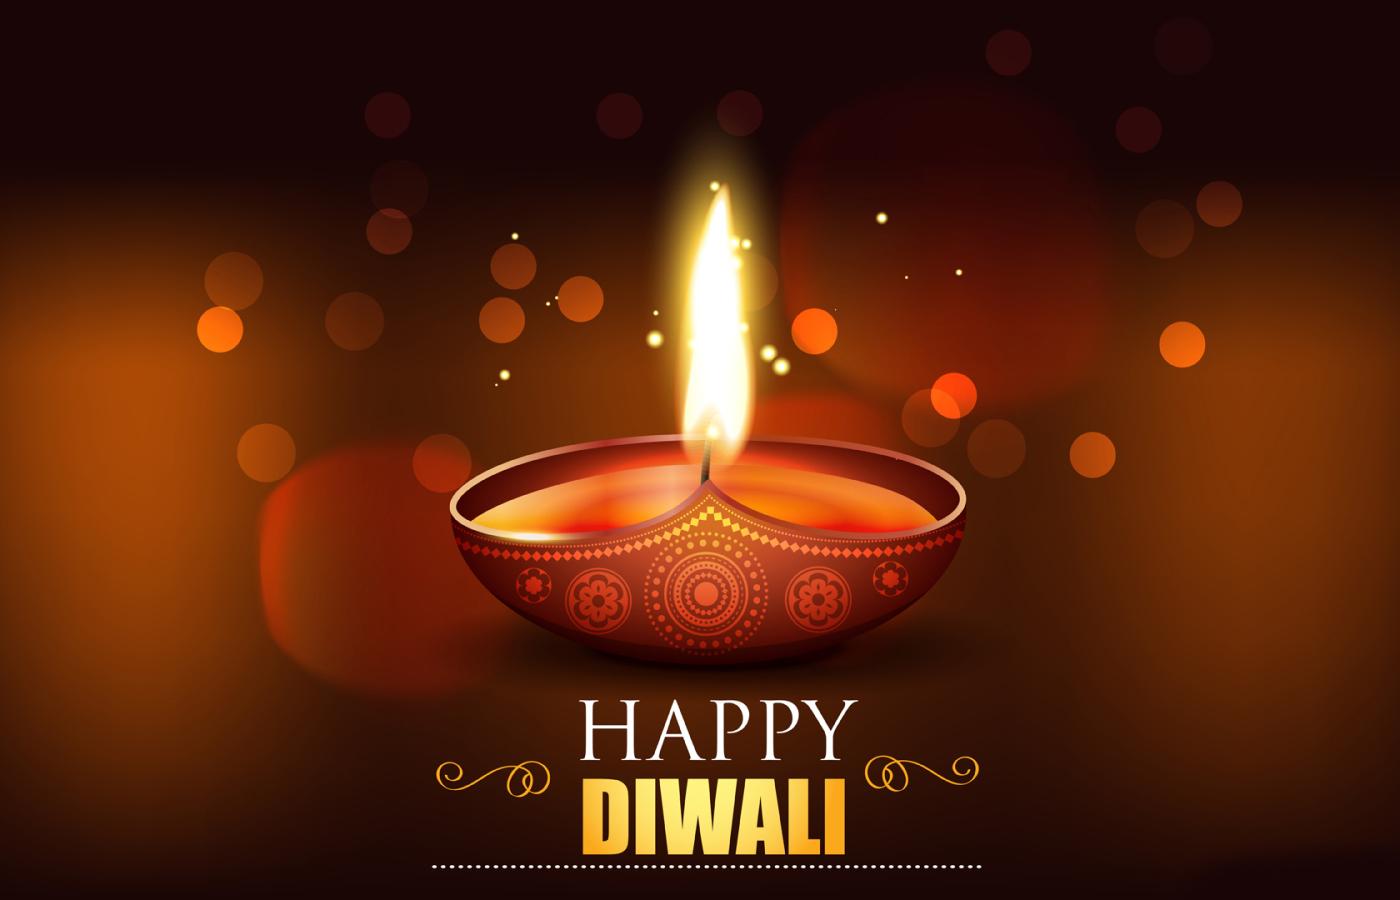 Happy Diwali 2020 Wallpaper in 1400x900 Resolution